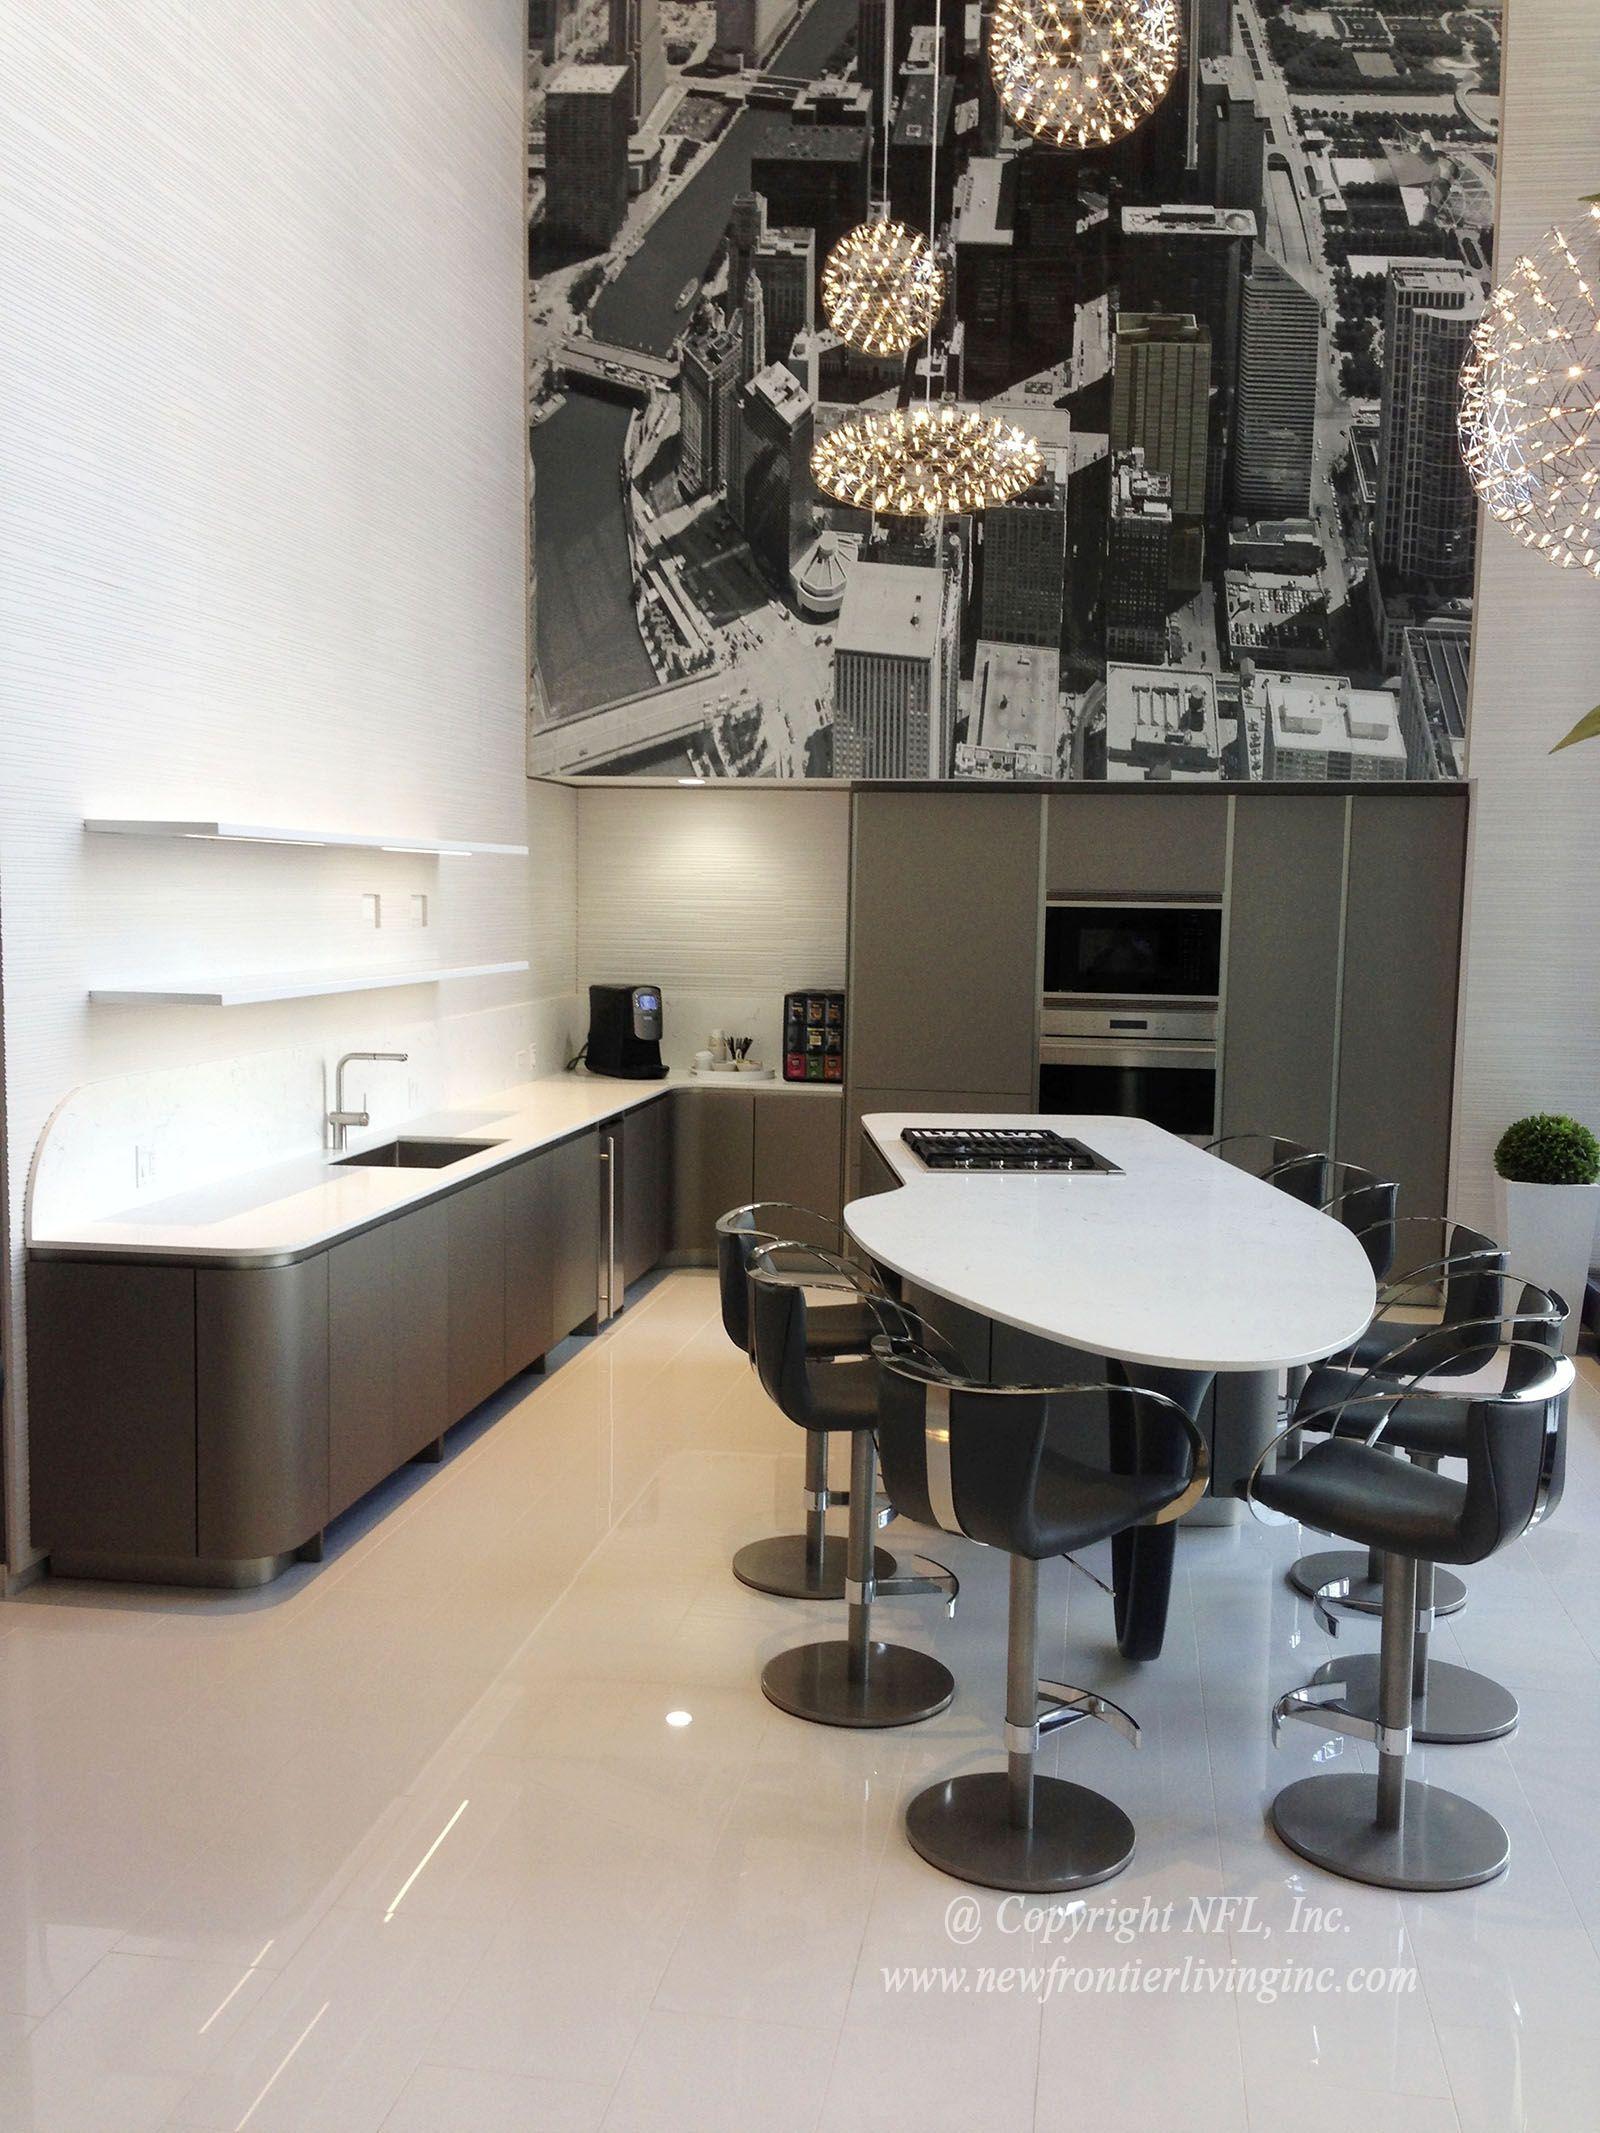 Snaidero kitchen Sky Lounge, 73 E. Lake